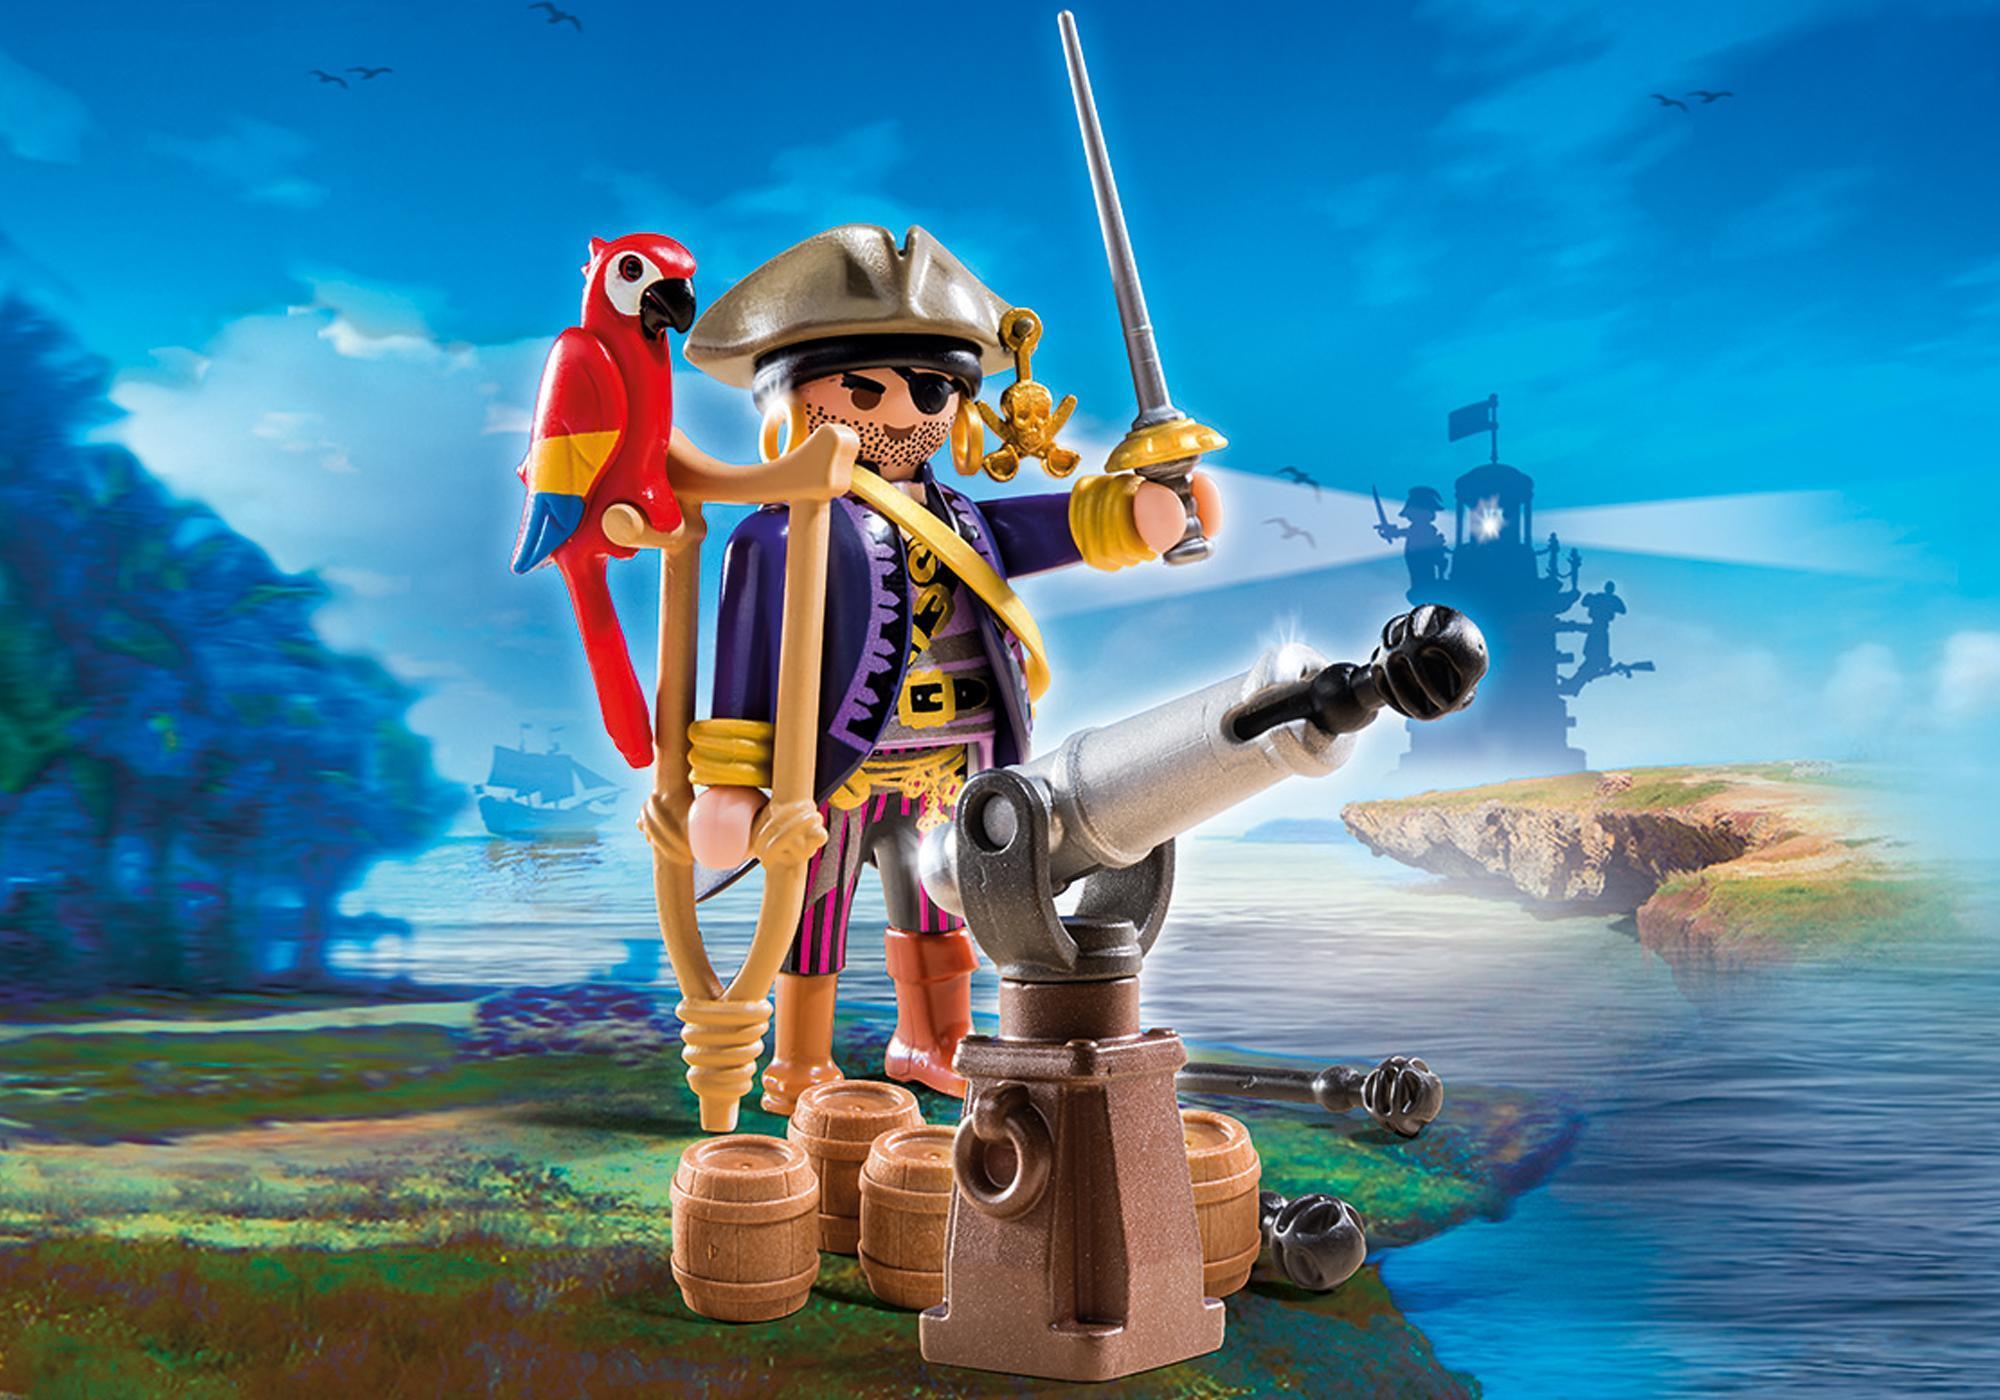 http://media.playmobil.com/i/playmobil/6684_product_detail/Pirate Captain